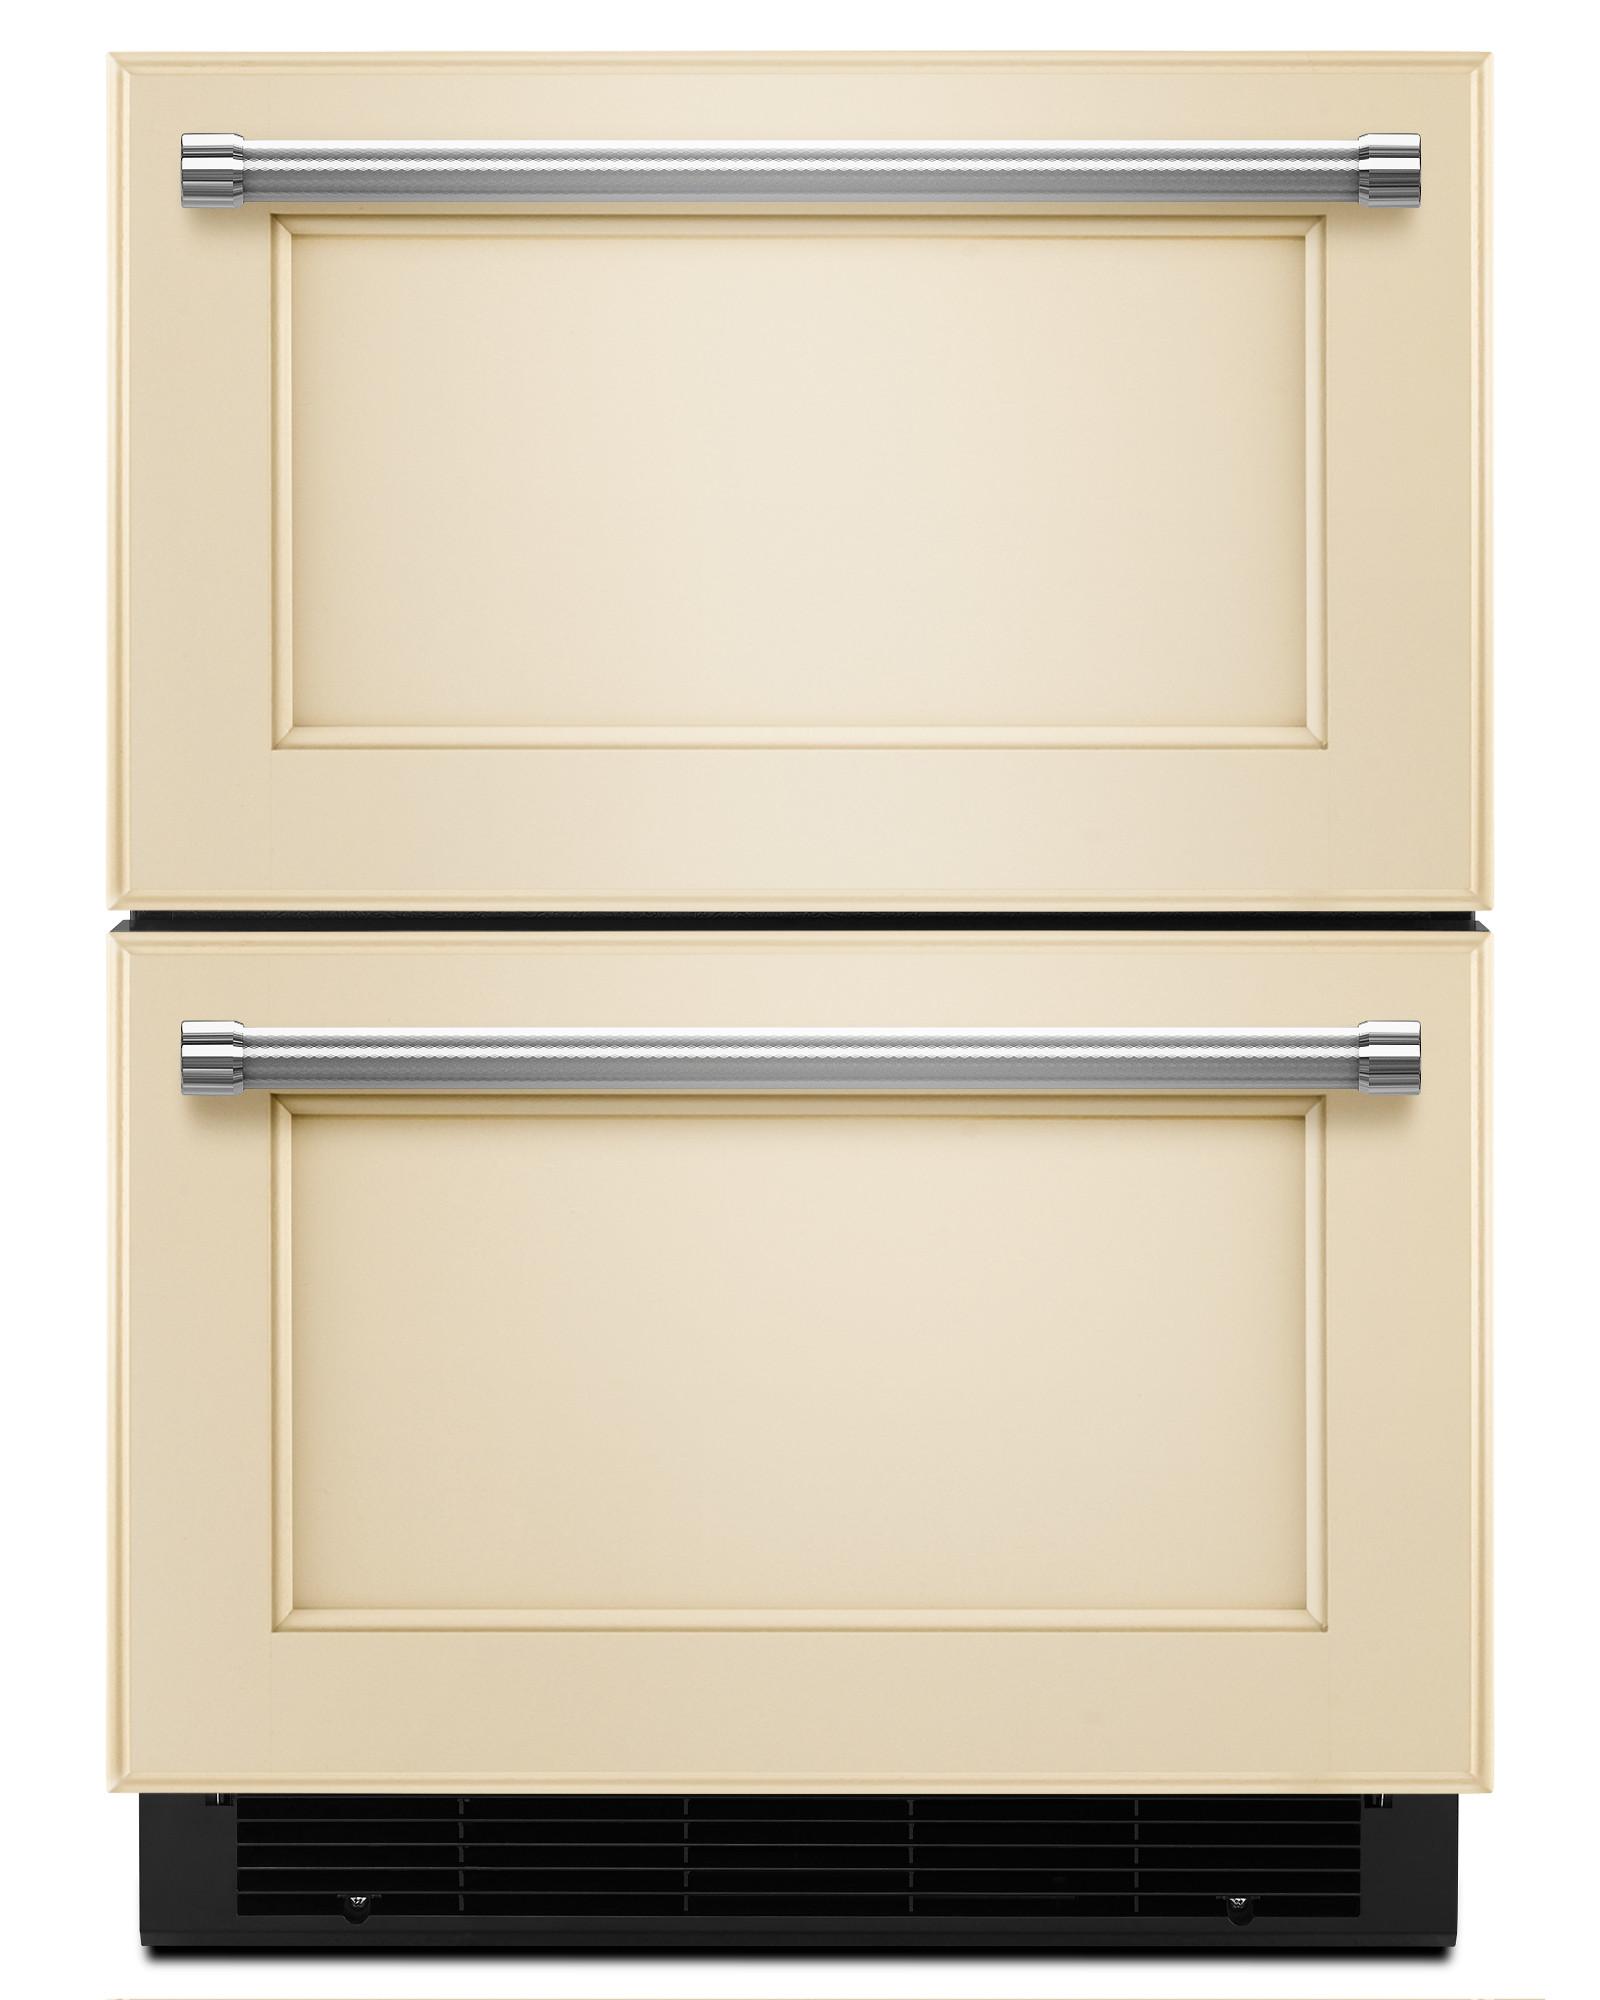 KitchenAid KUDR204EPA 4.7 cu. ft. Double Refrigerator Drawer - Panel Ready